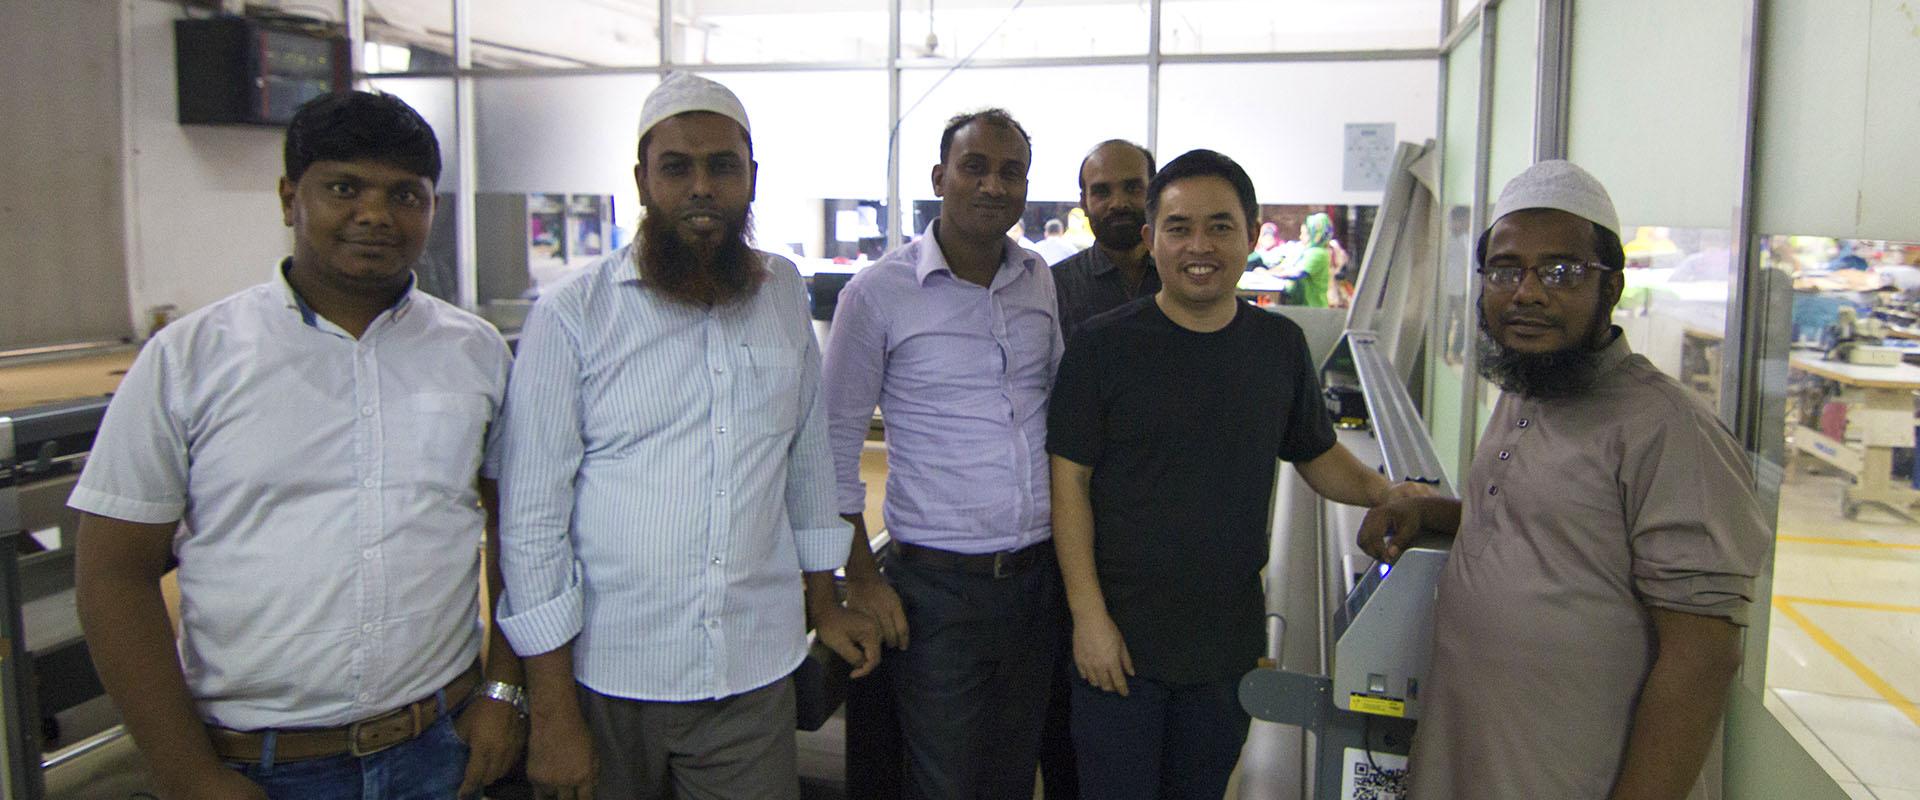 CAD Room Workers